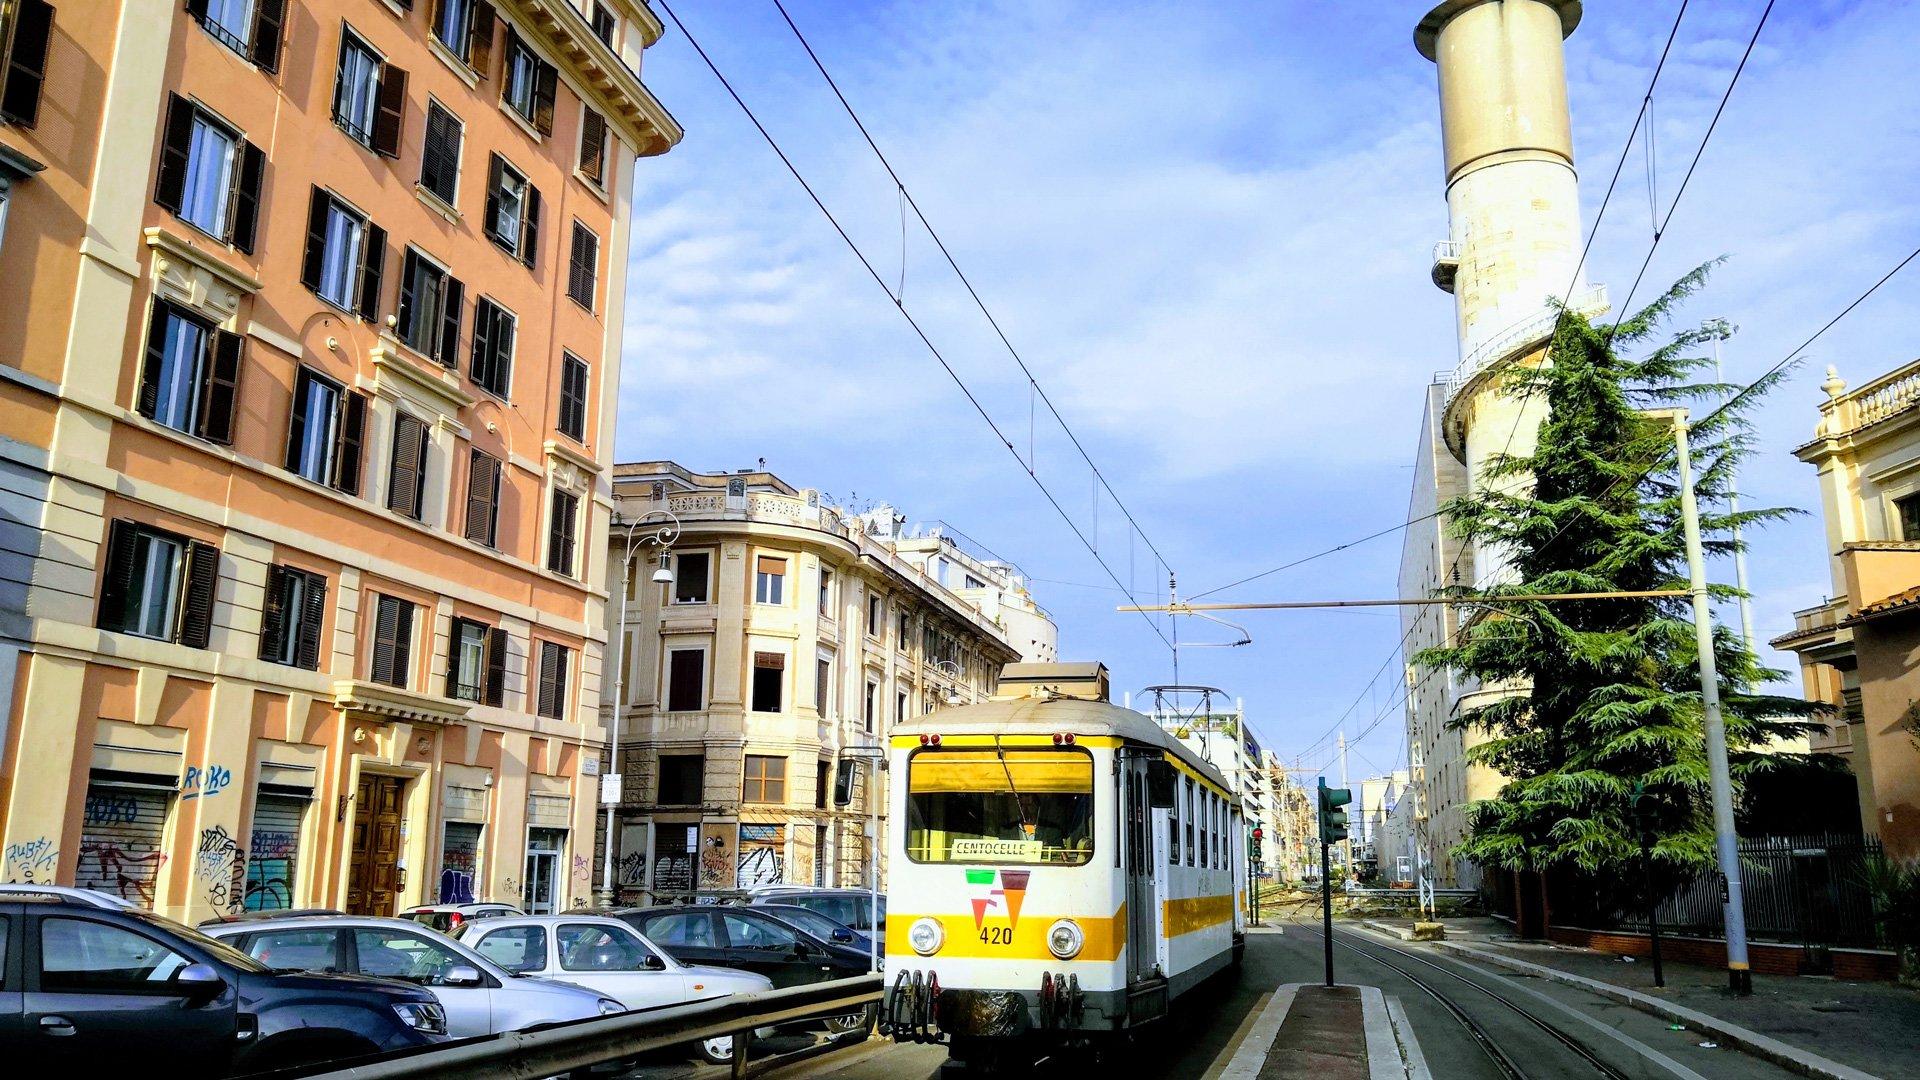 How do I use Rome's public transportation network?